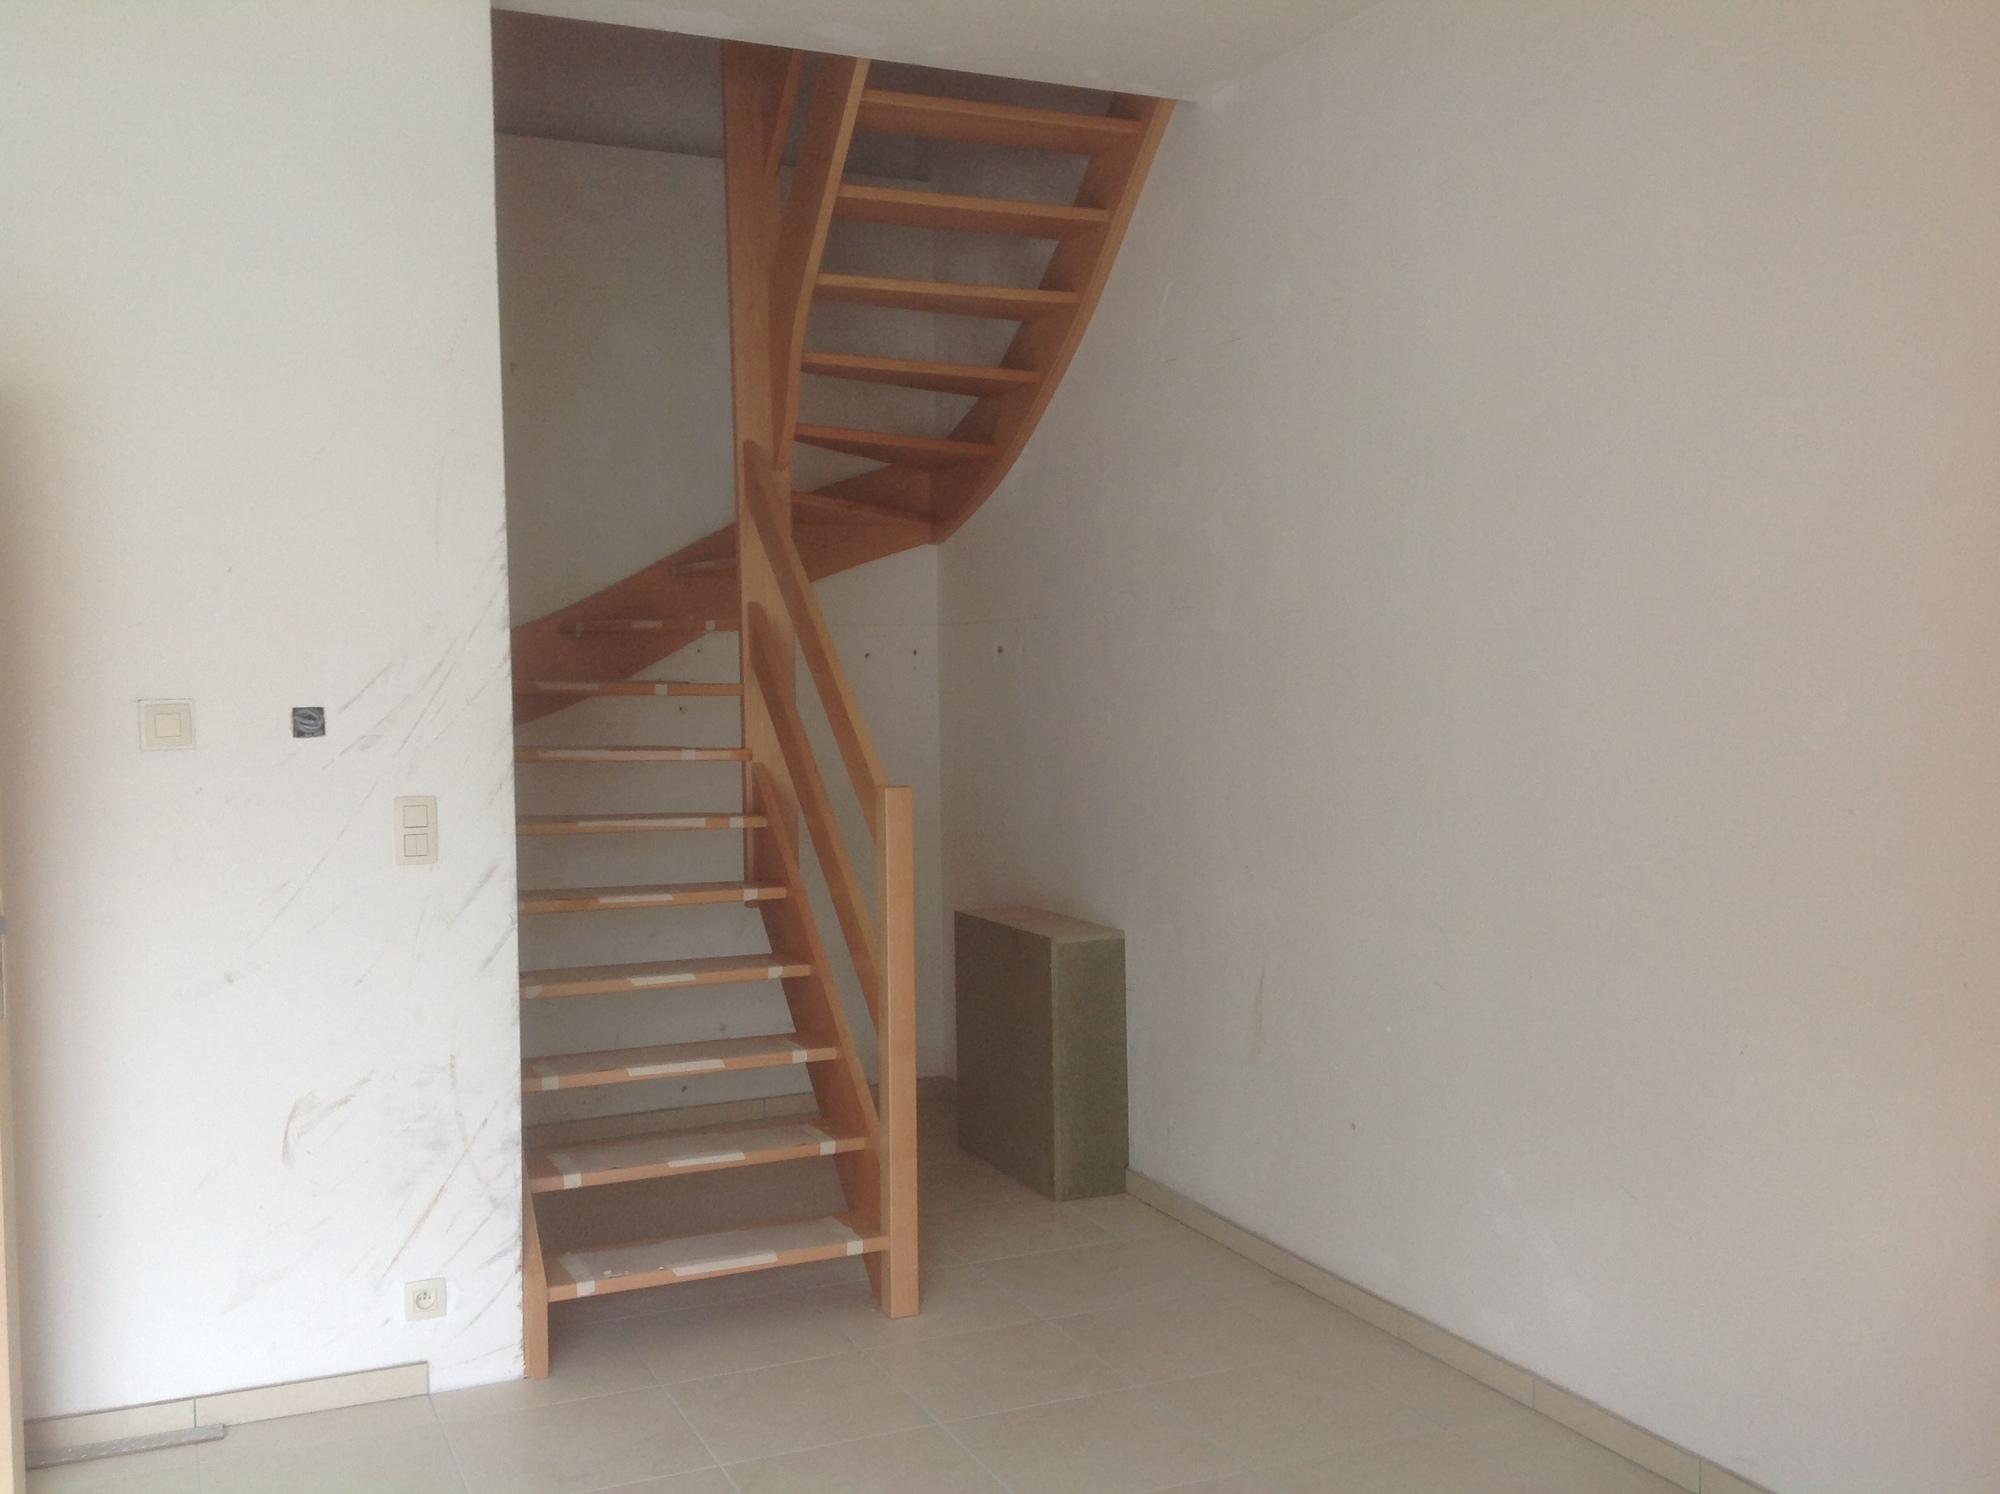 Menuiserie Escalier Bois - Escaliers en bois Jupille, Li u00e8ge Menuiserie Patrick Debouny H u00eatre, ch u00eane,érable